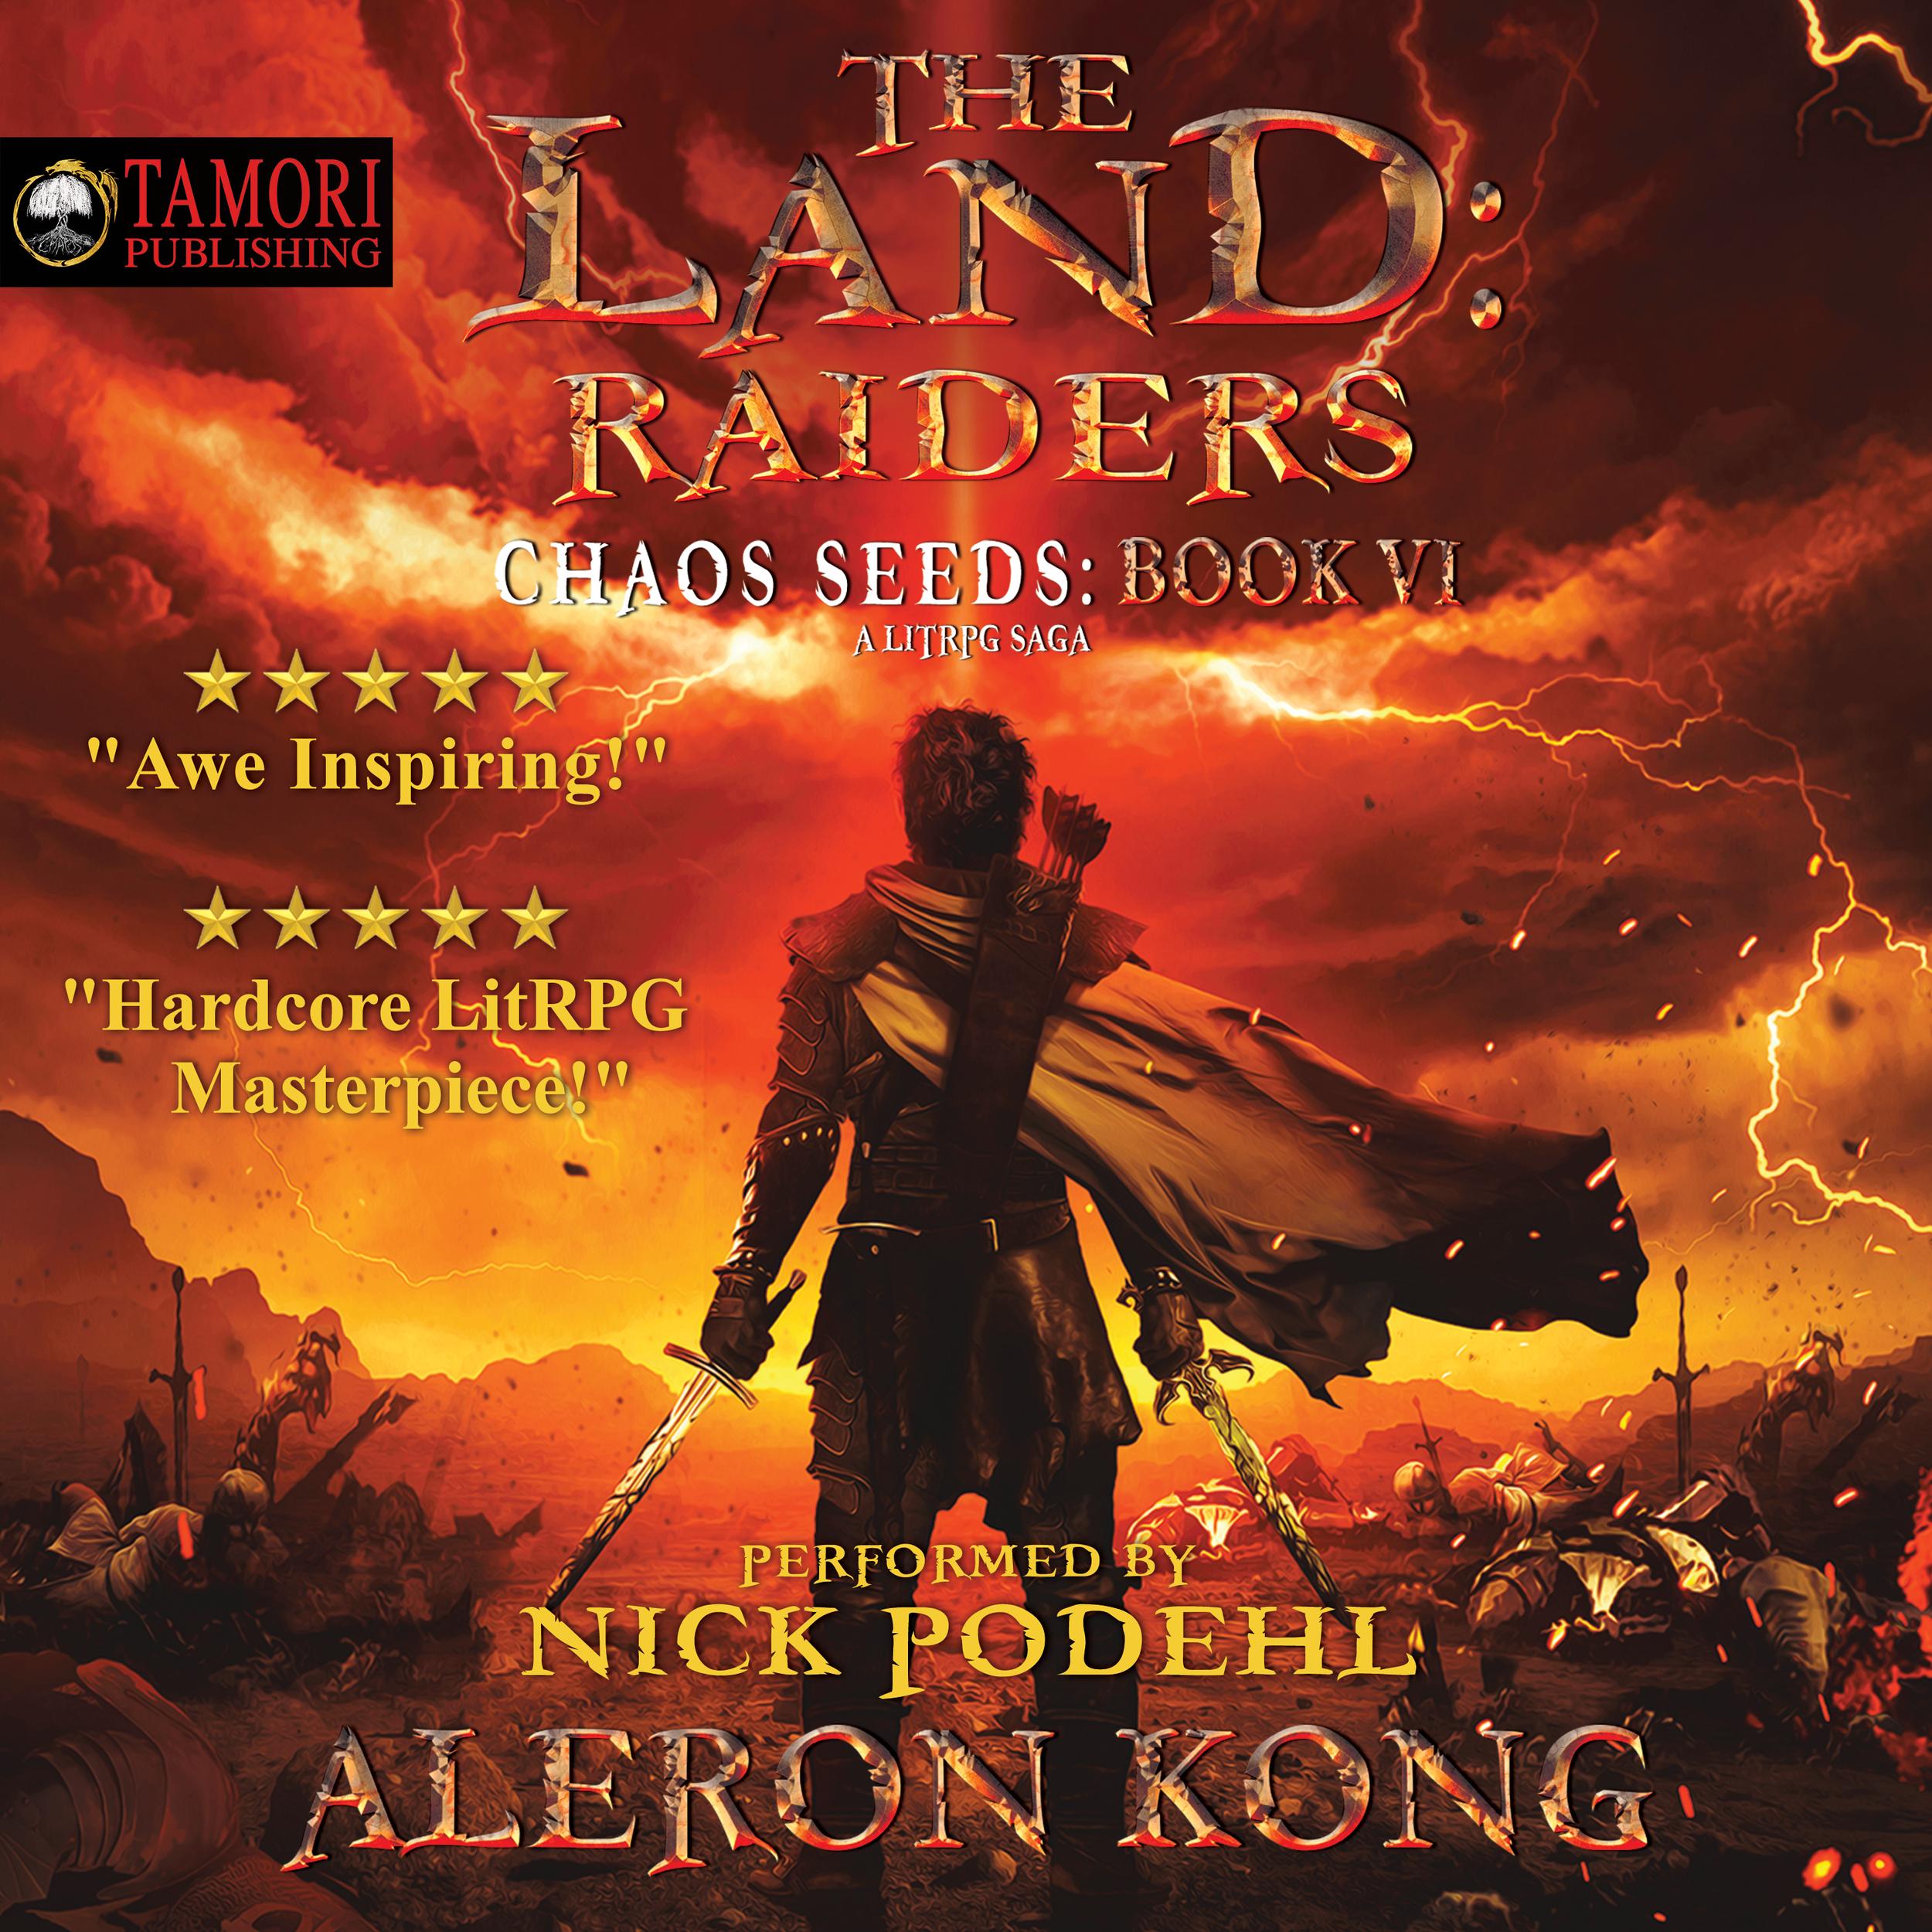 #LitRPG #Aleron #Author #TheLand #ChaosSeeds #GnomesRule